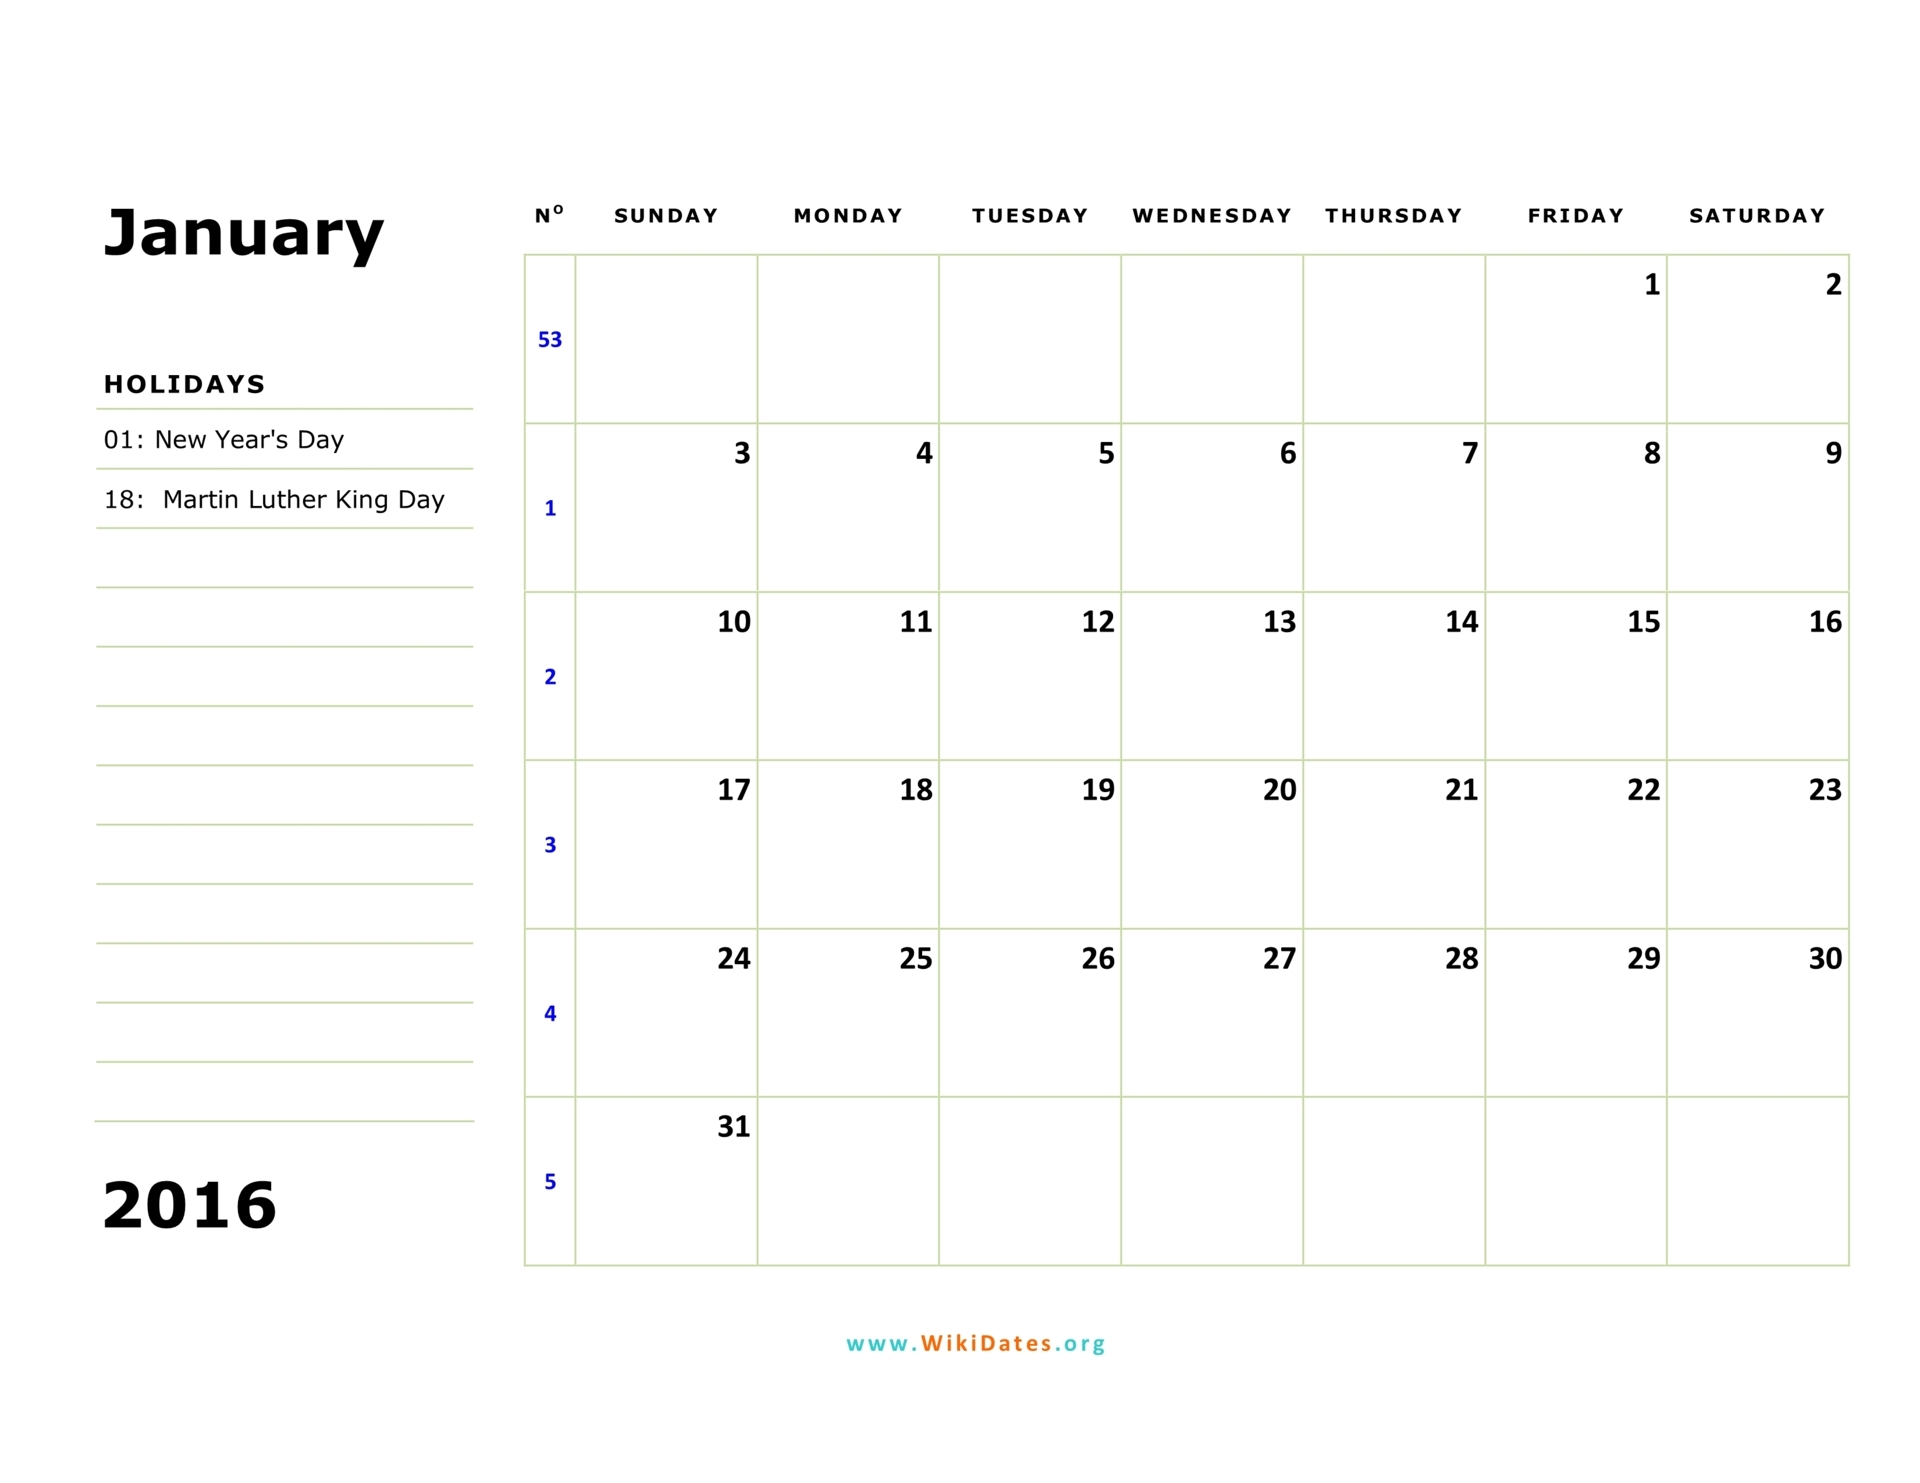 2016 Calendar | WikiDates.org